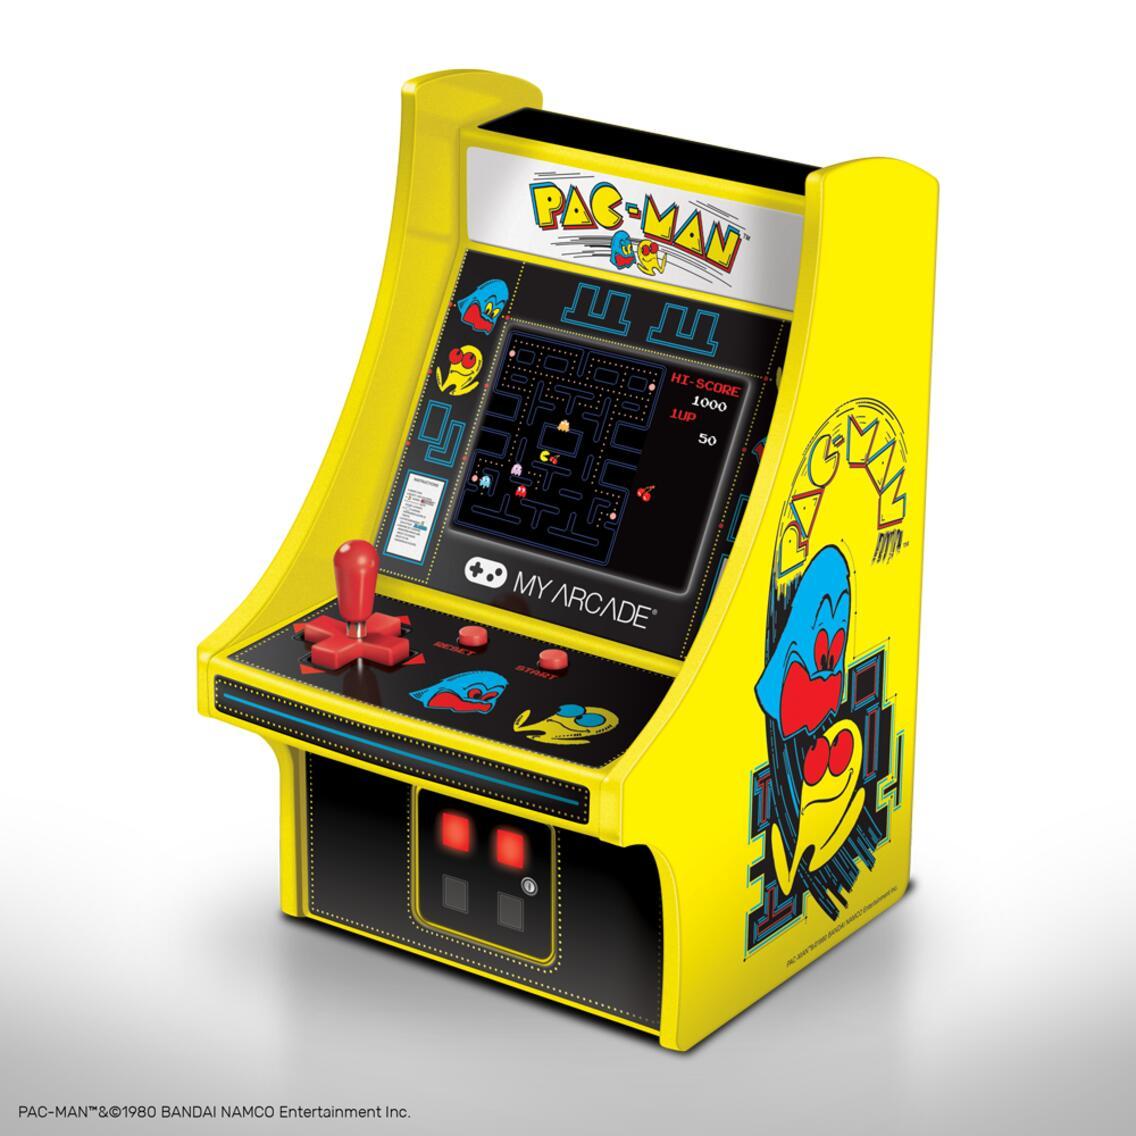 My Arcade PAC-MAN Micro Player